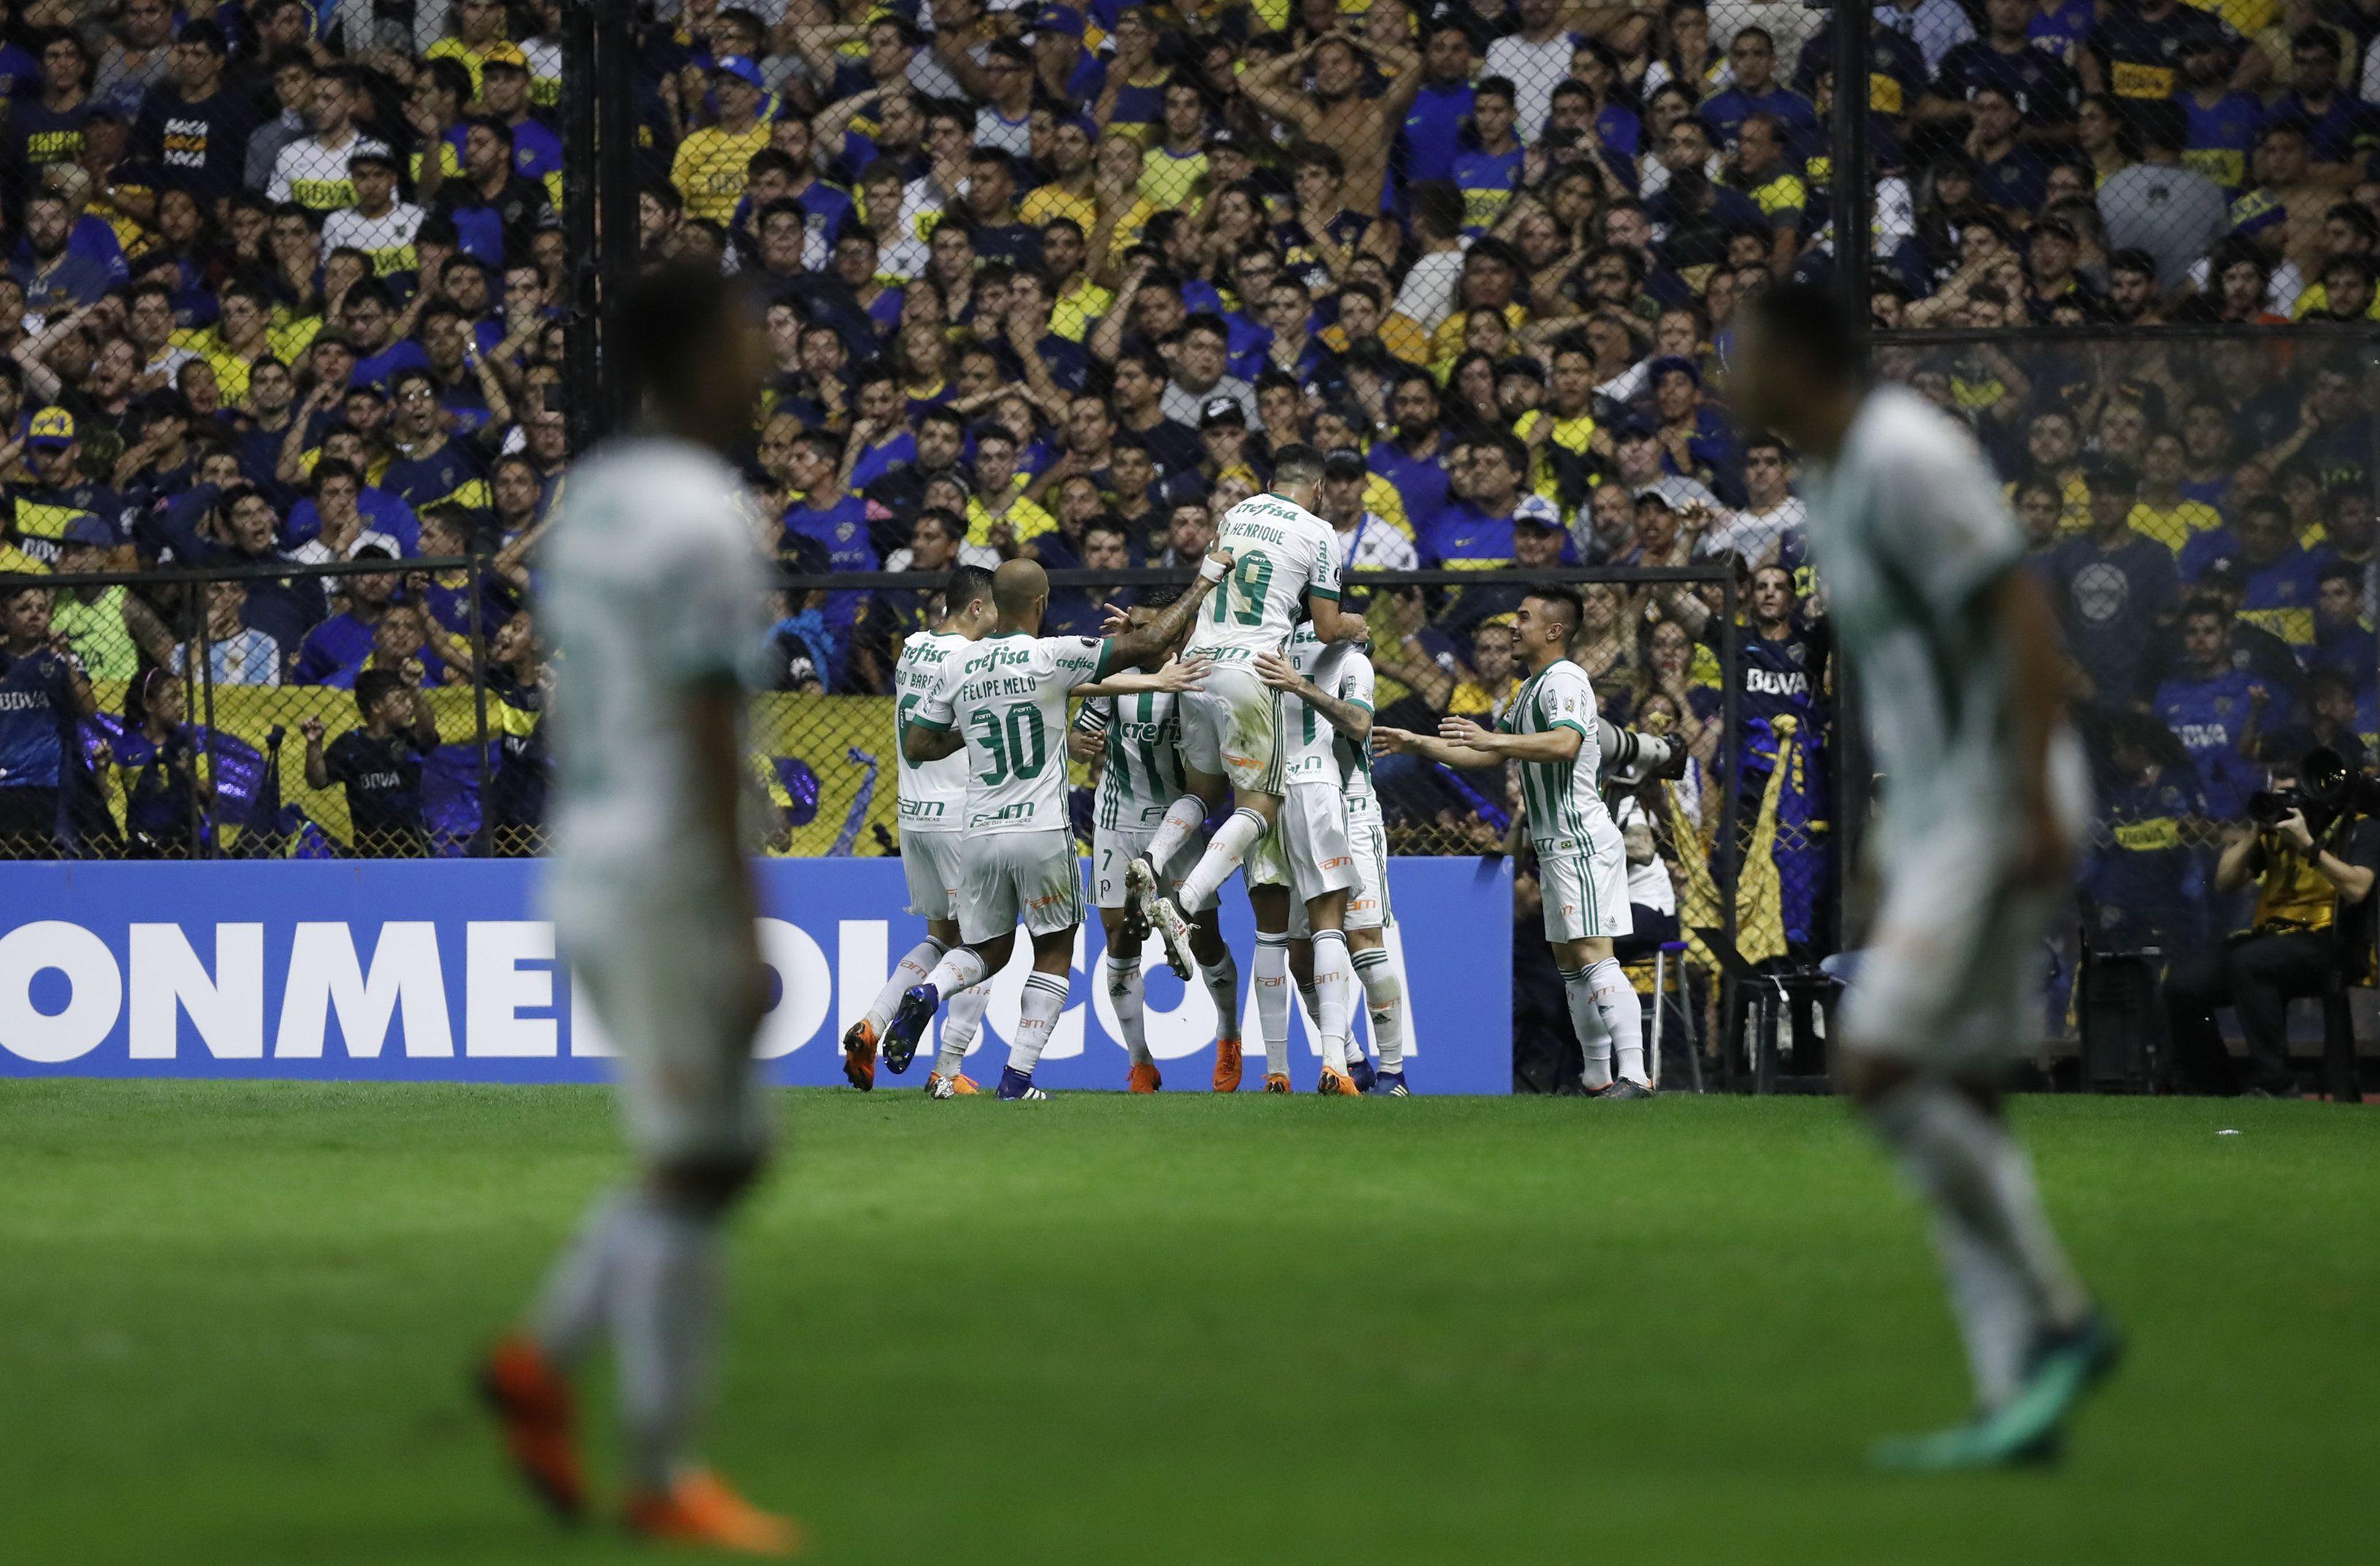 Palmeiras triunfó en La Bombonera. Foto: EFE